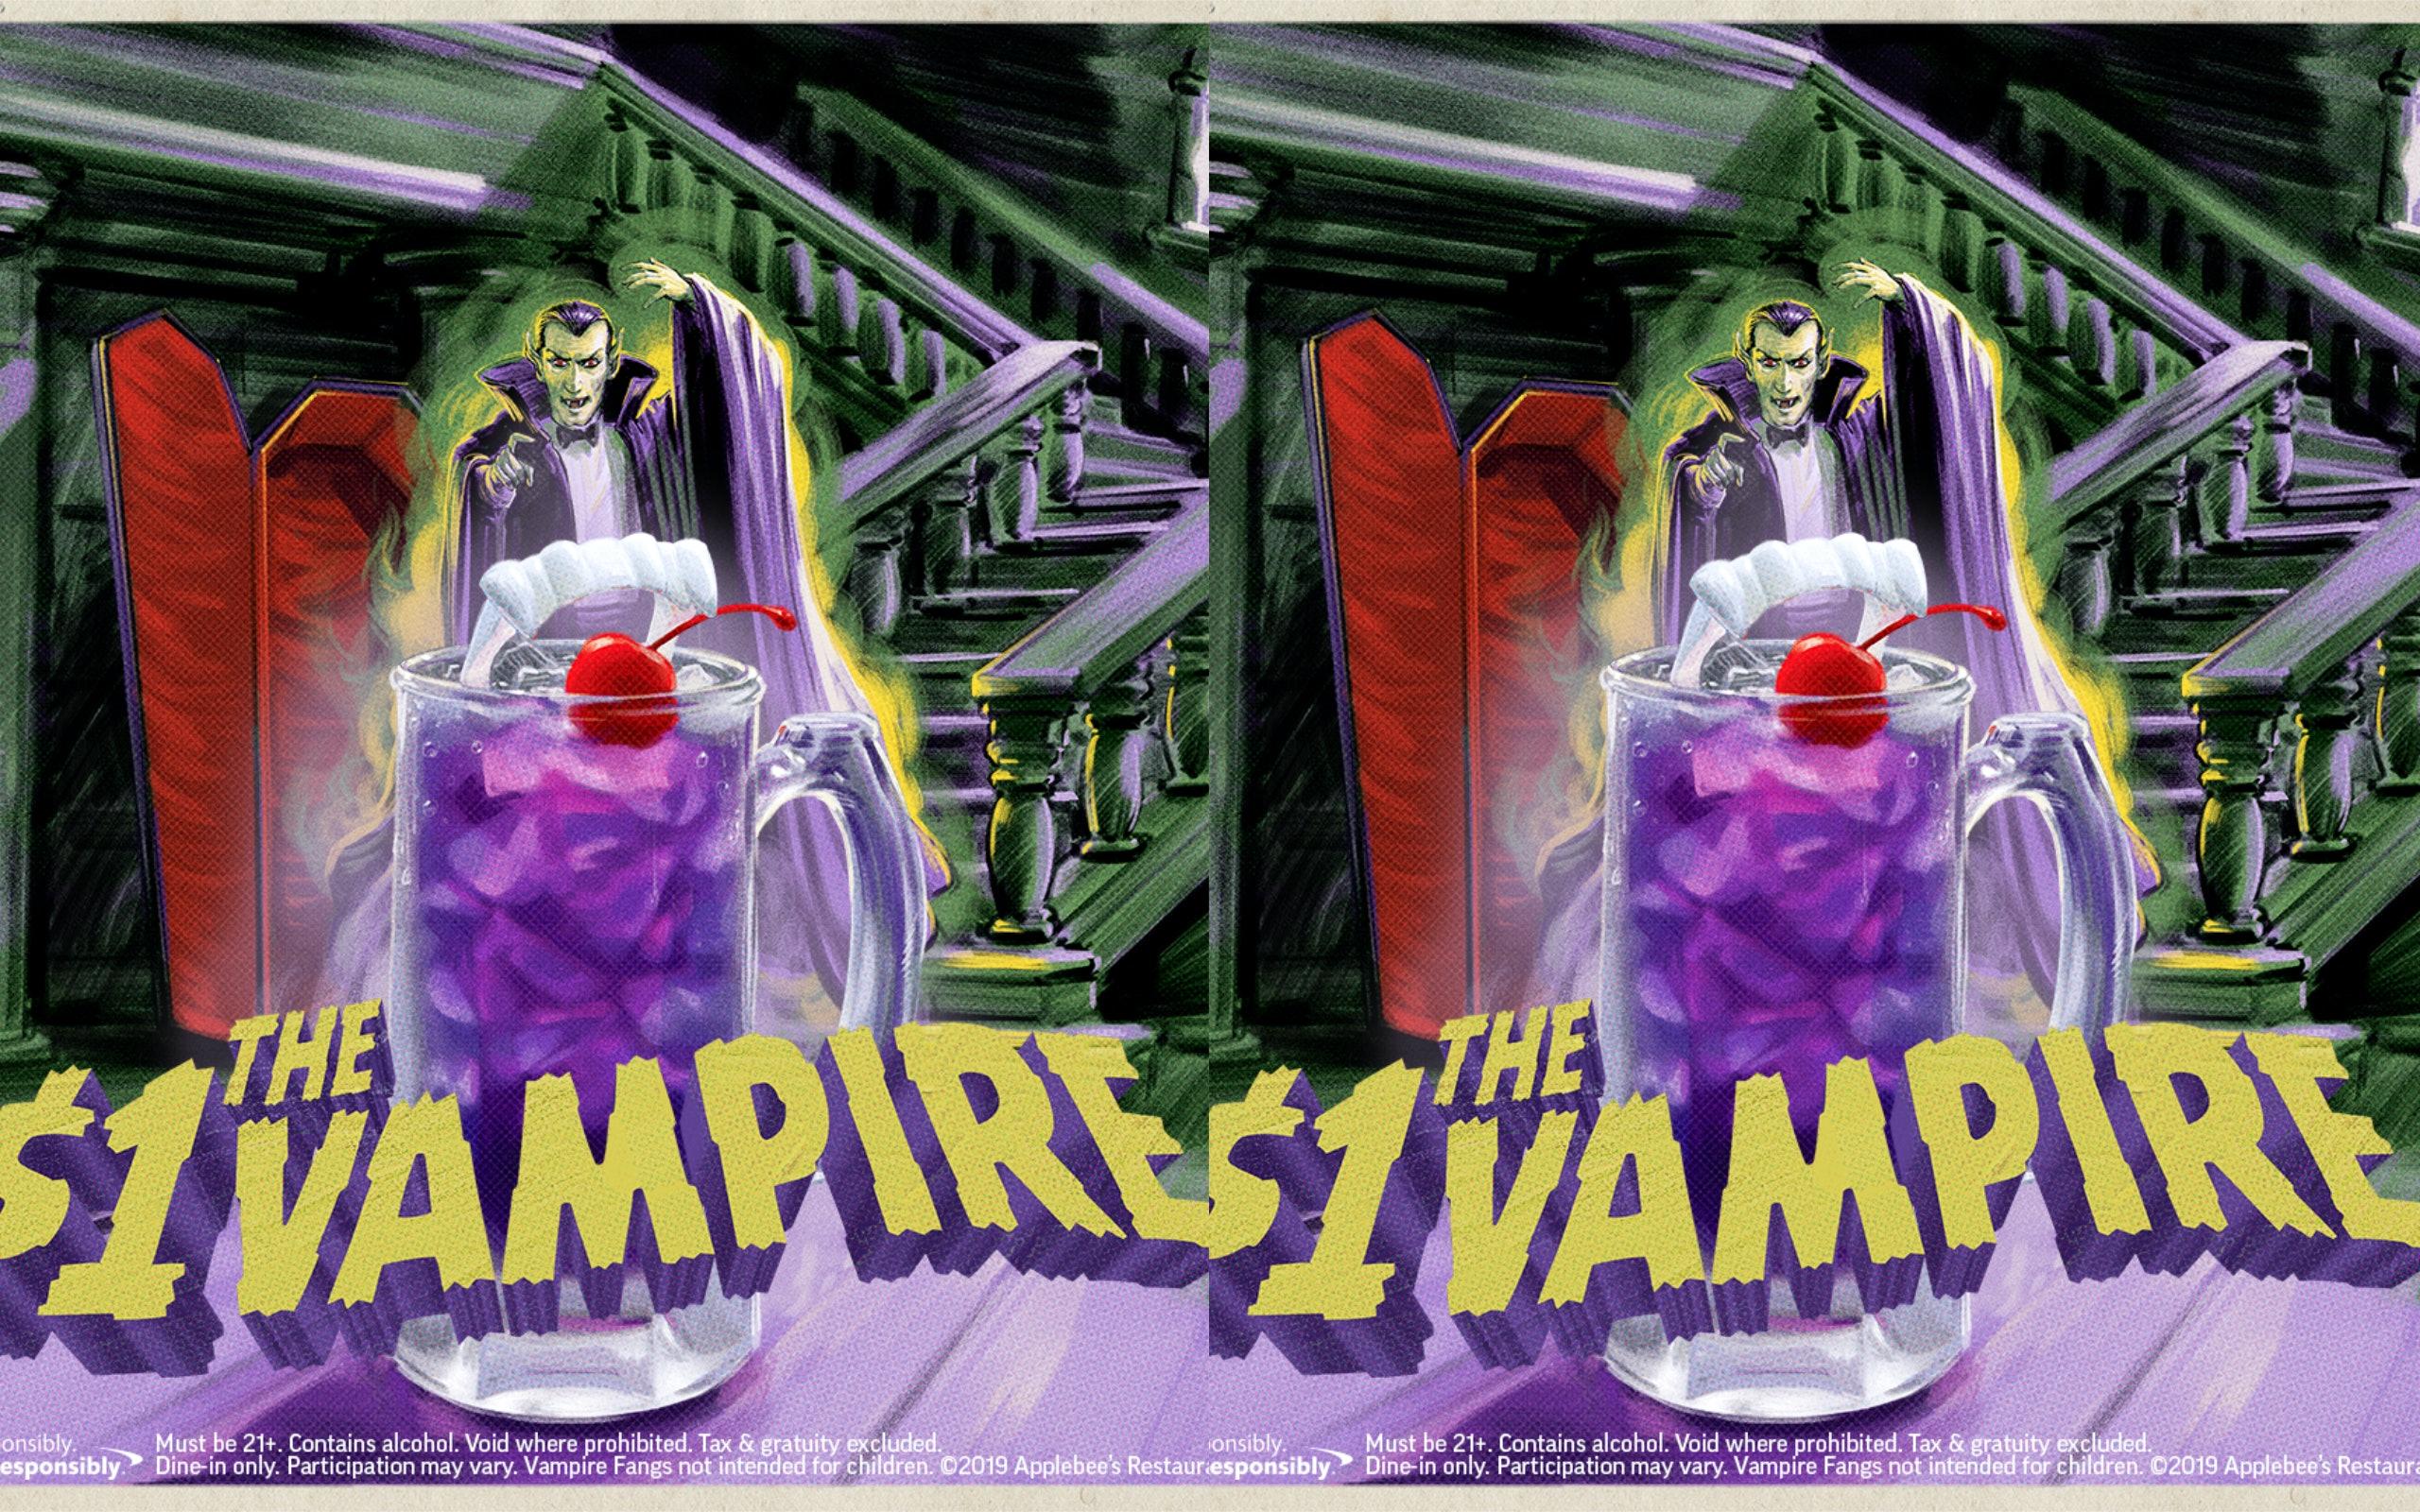 The Best Vampire Applebee's Images